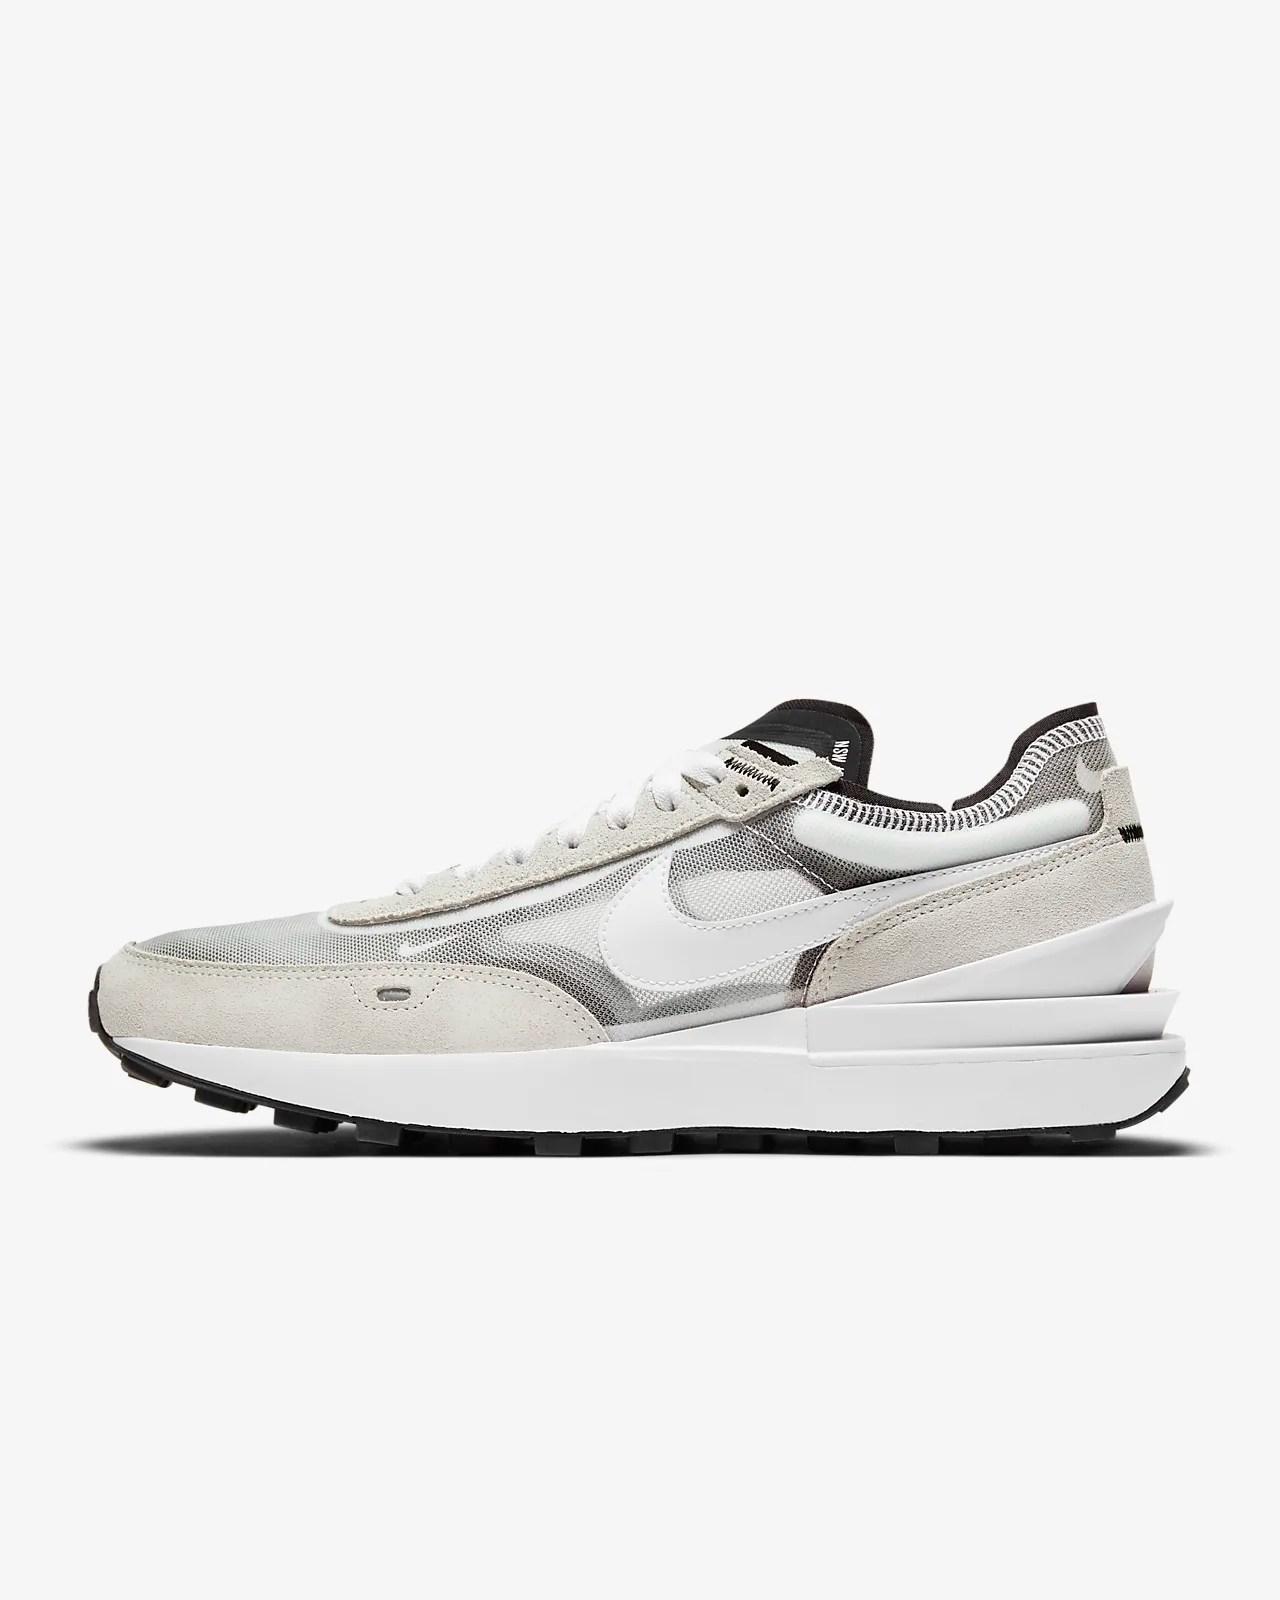 Nike Waffle One Men's Shoe. Nike MY